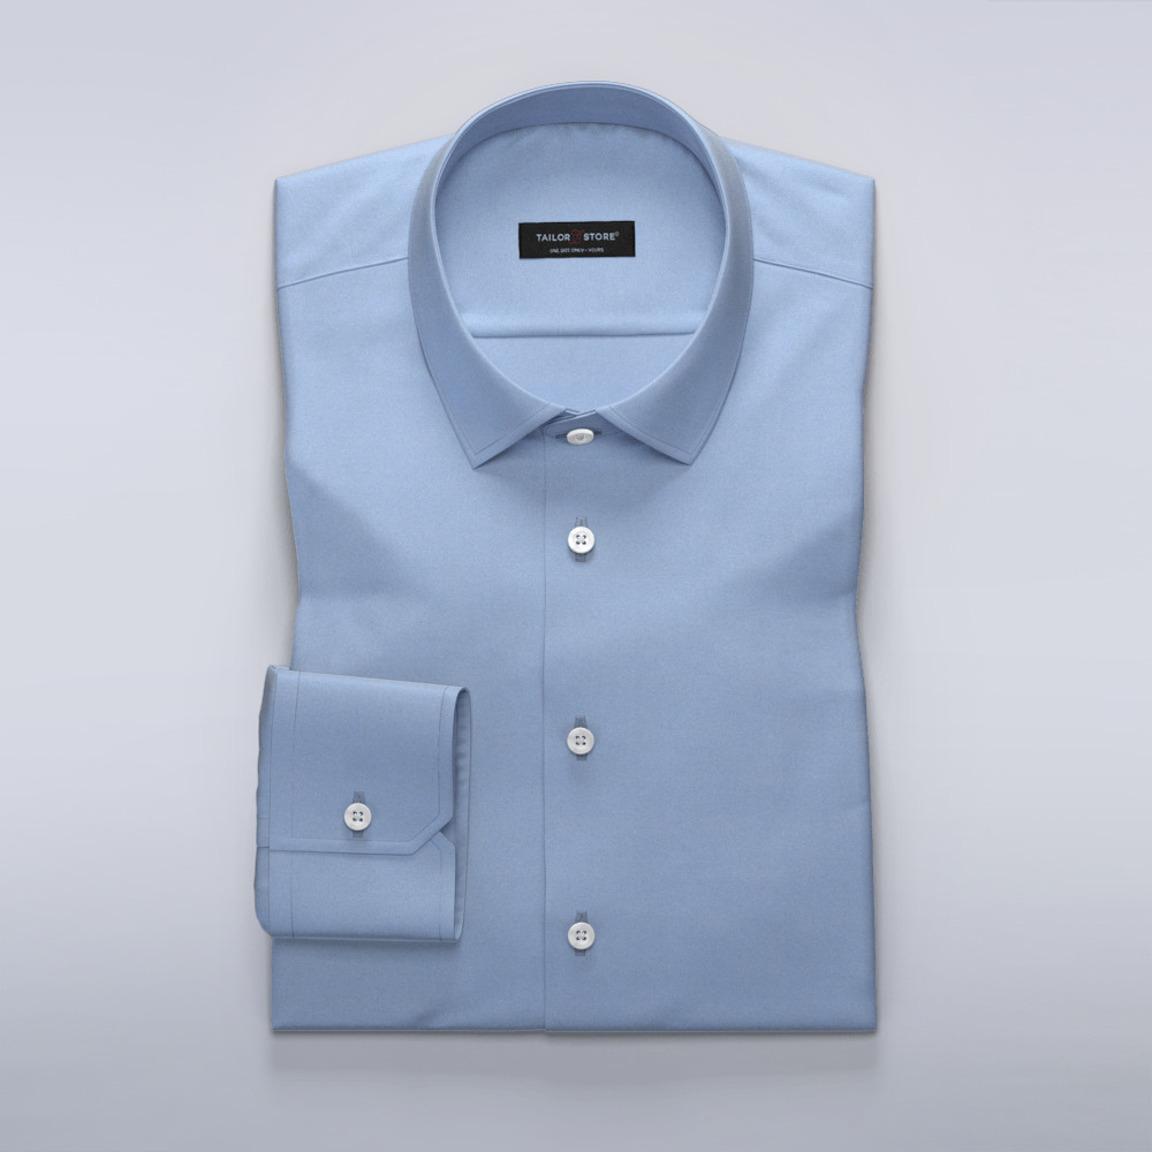 Dames business overhemd in lichtblauw herringbone